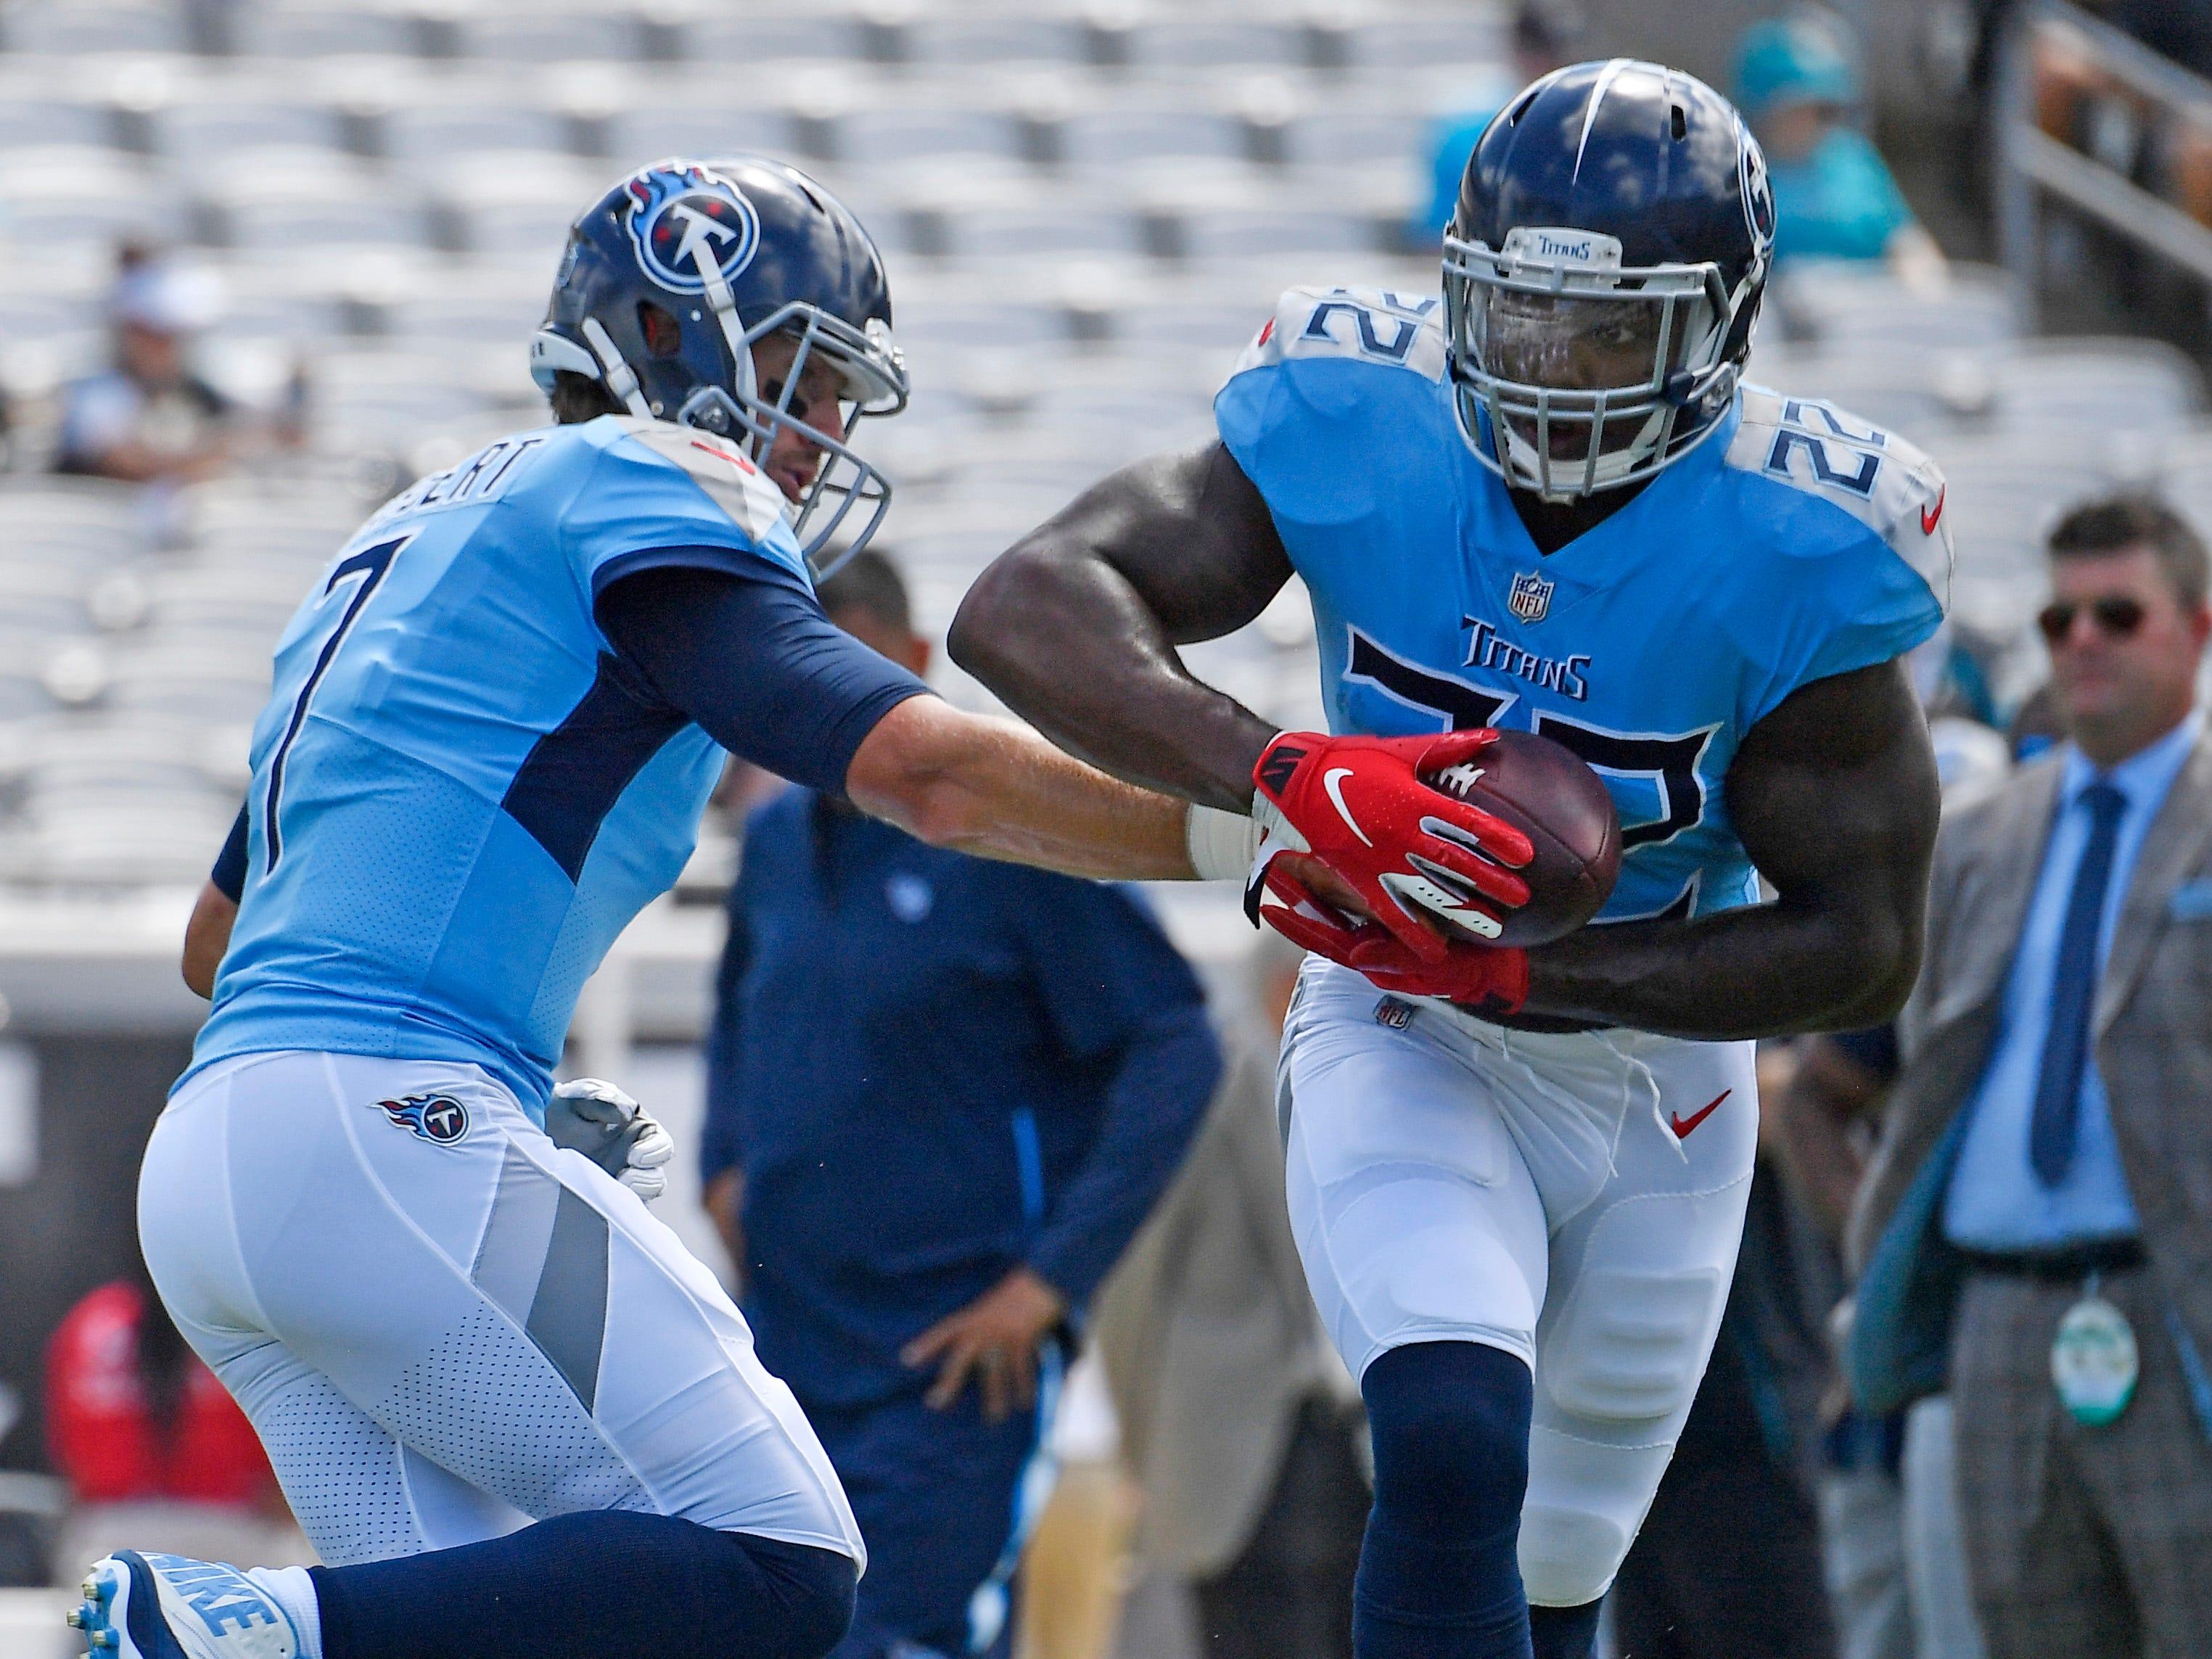 Titans running back Derrick Henry (22) takes a handoff from quarterback Blaine Gabbert (7) in warmups at TIAA Bank Field Sunday, Sept. 23, 2018, in Nashville, Tenn.